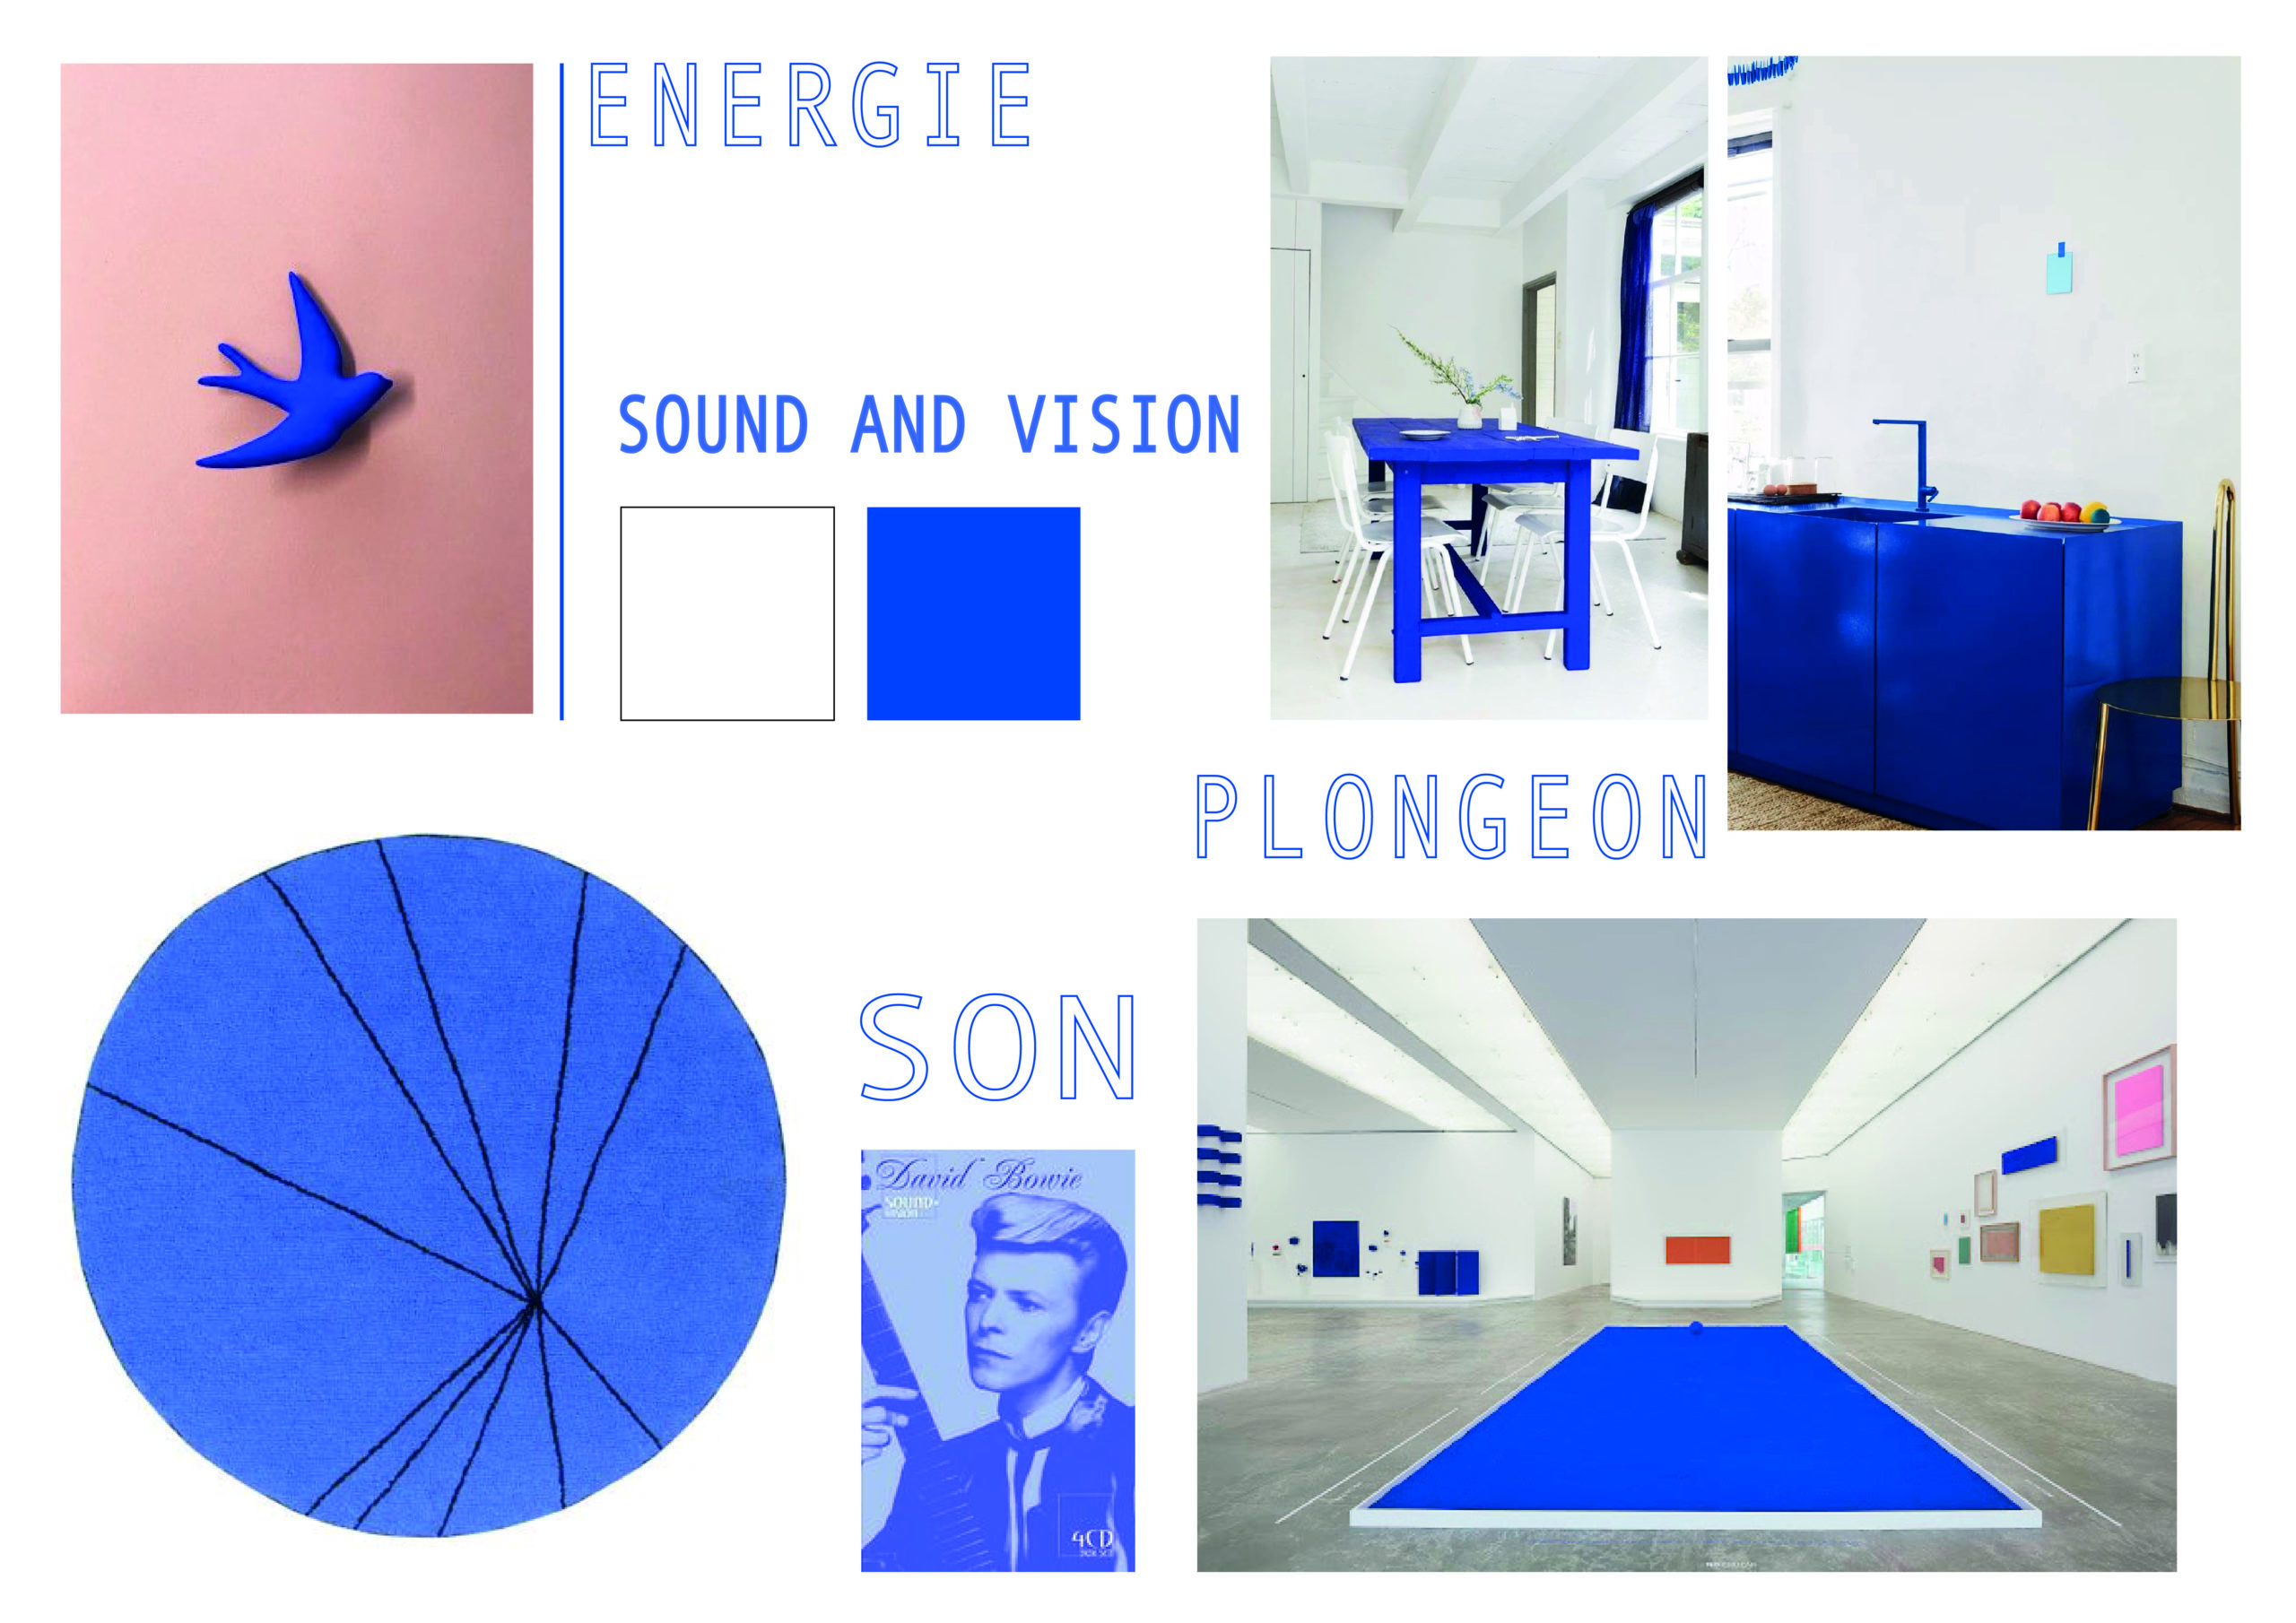 planche ambiance sound and vision_Plan de travail 1